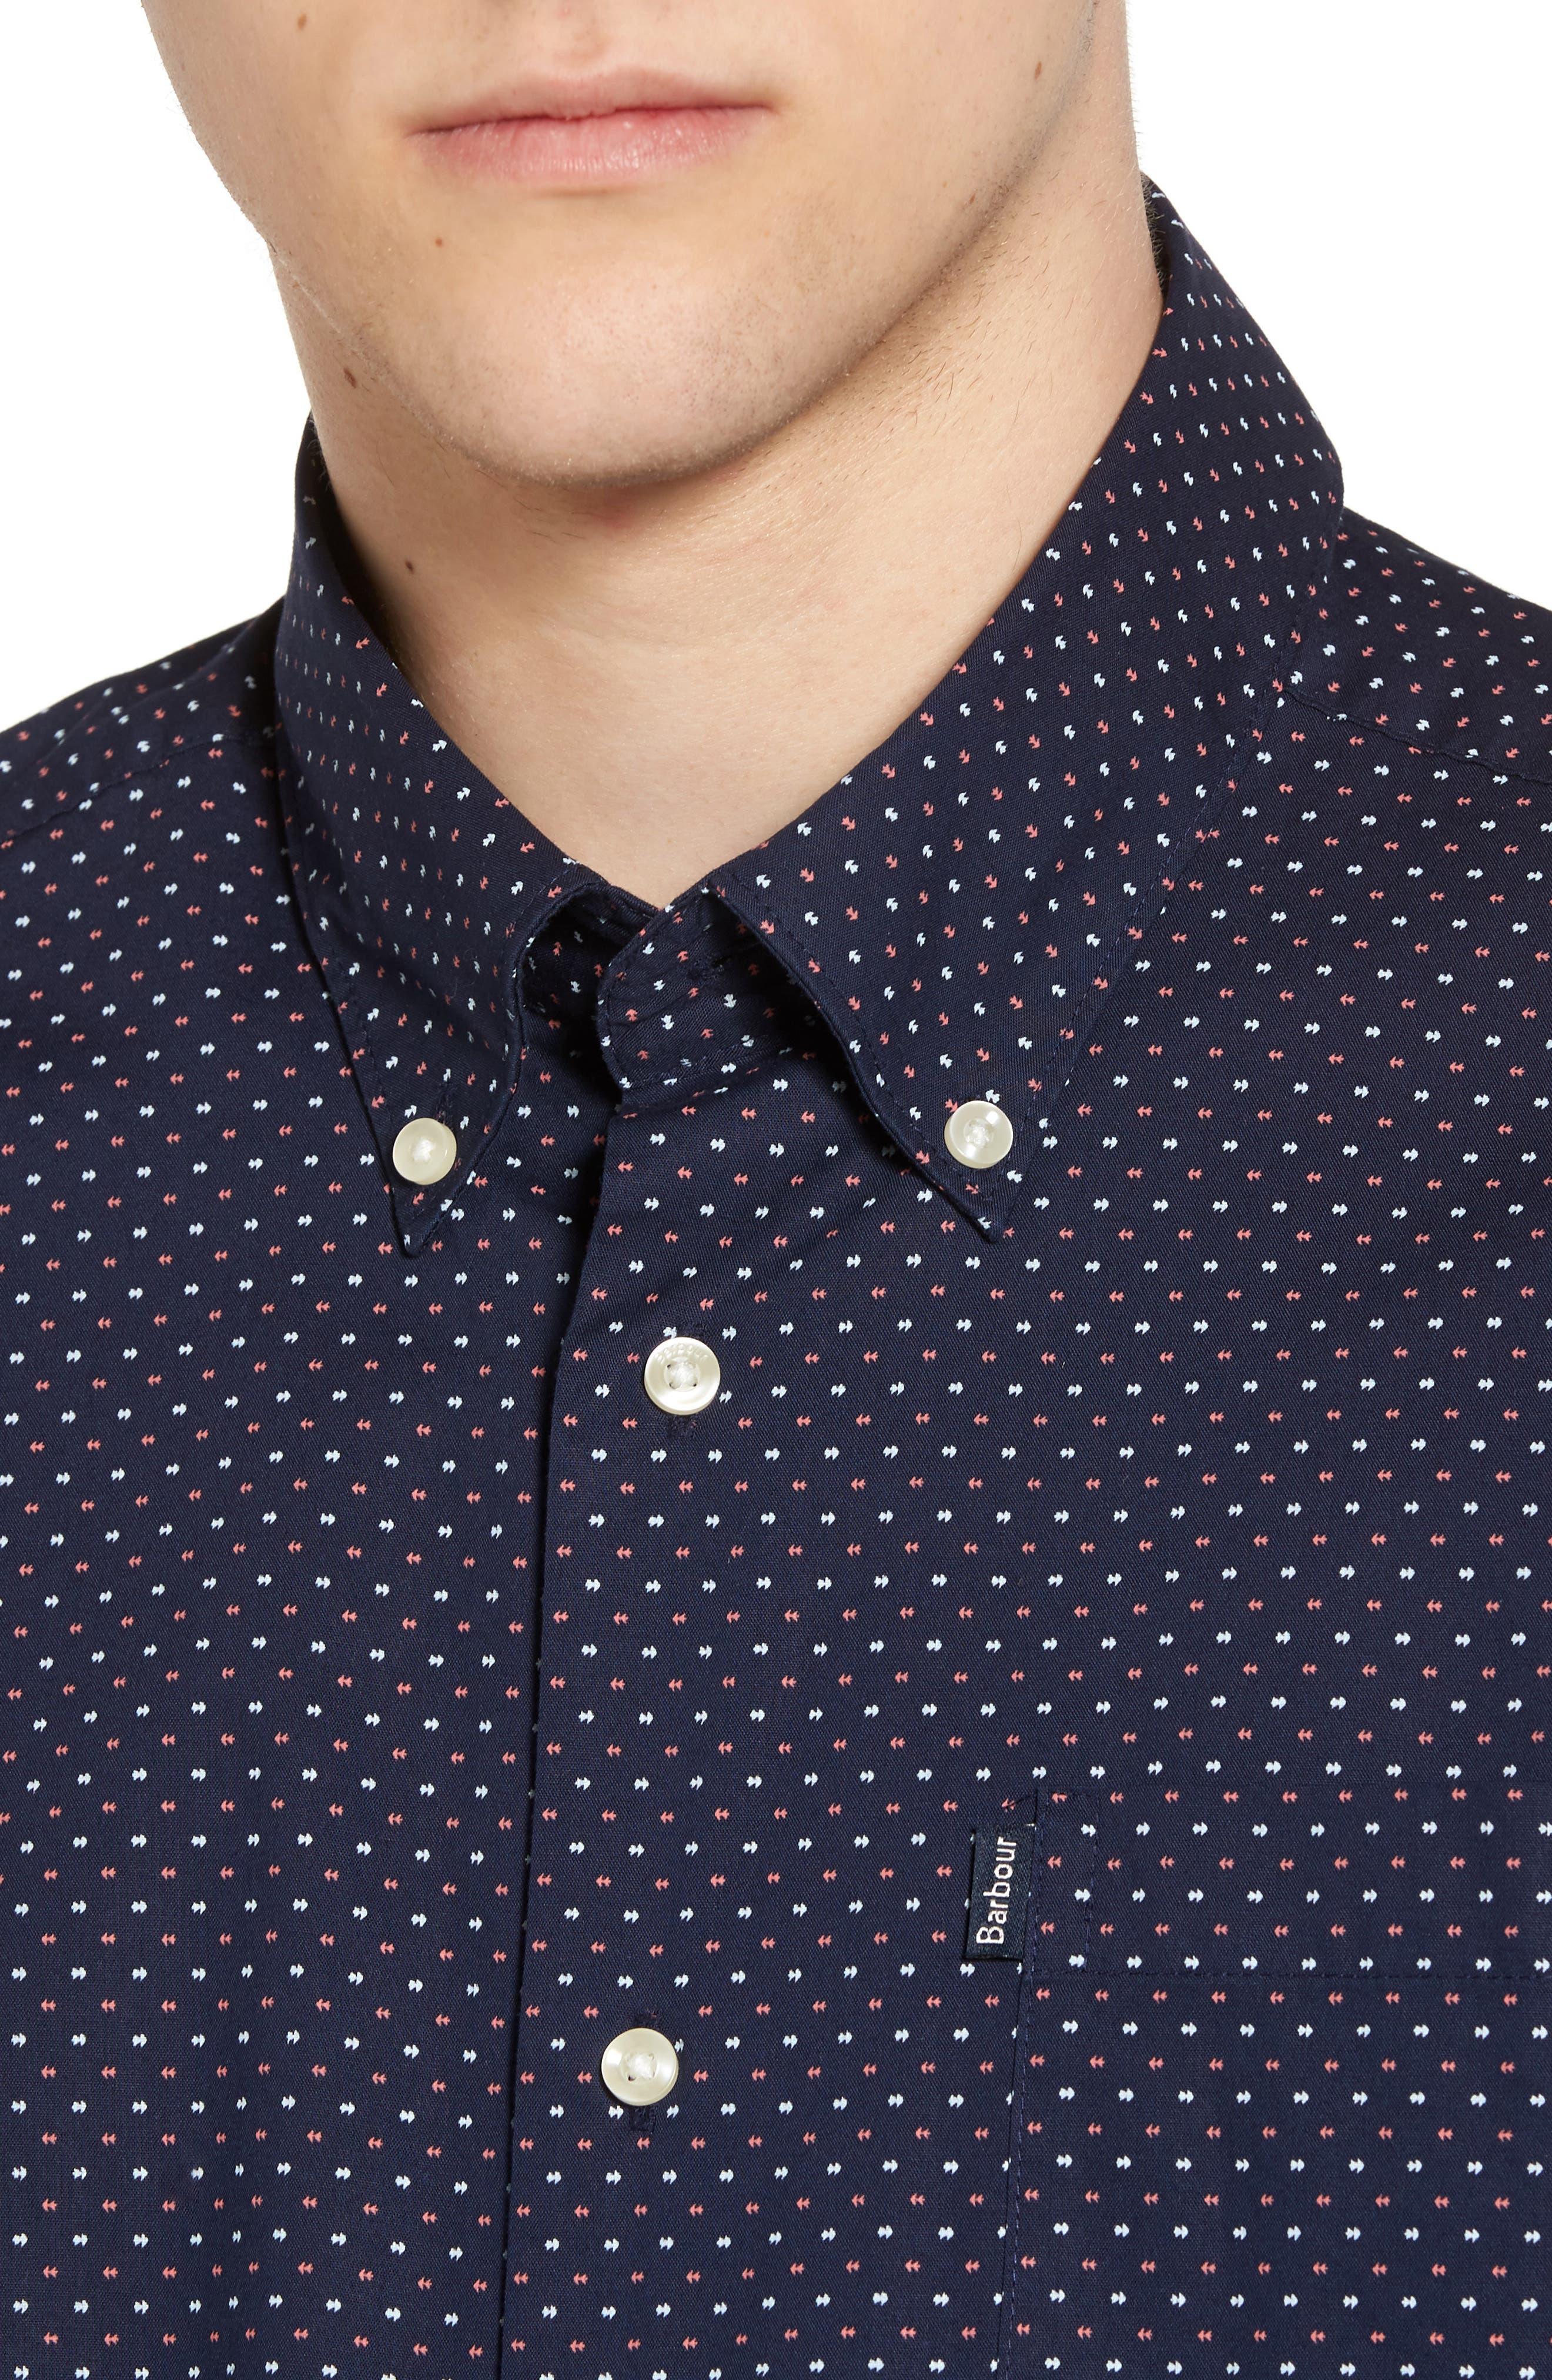 Cullen Trim Fit Print Sport Shirt,                             Alternate thumbnail 4, color,                             Navy